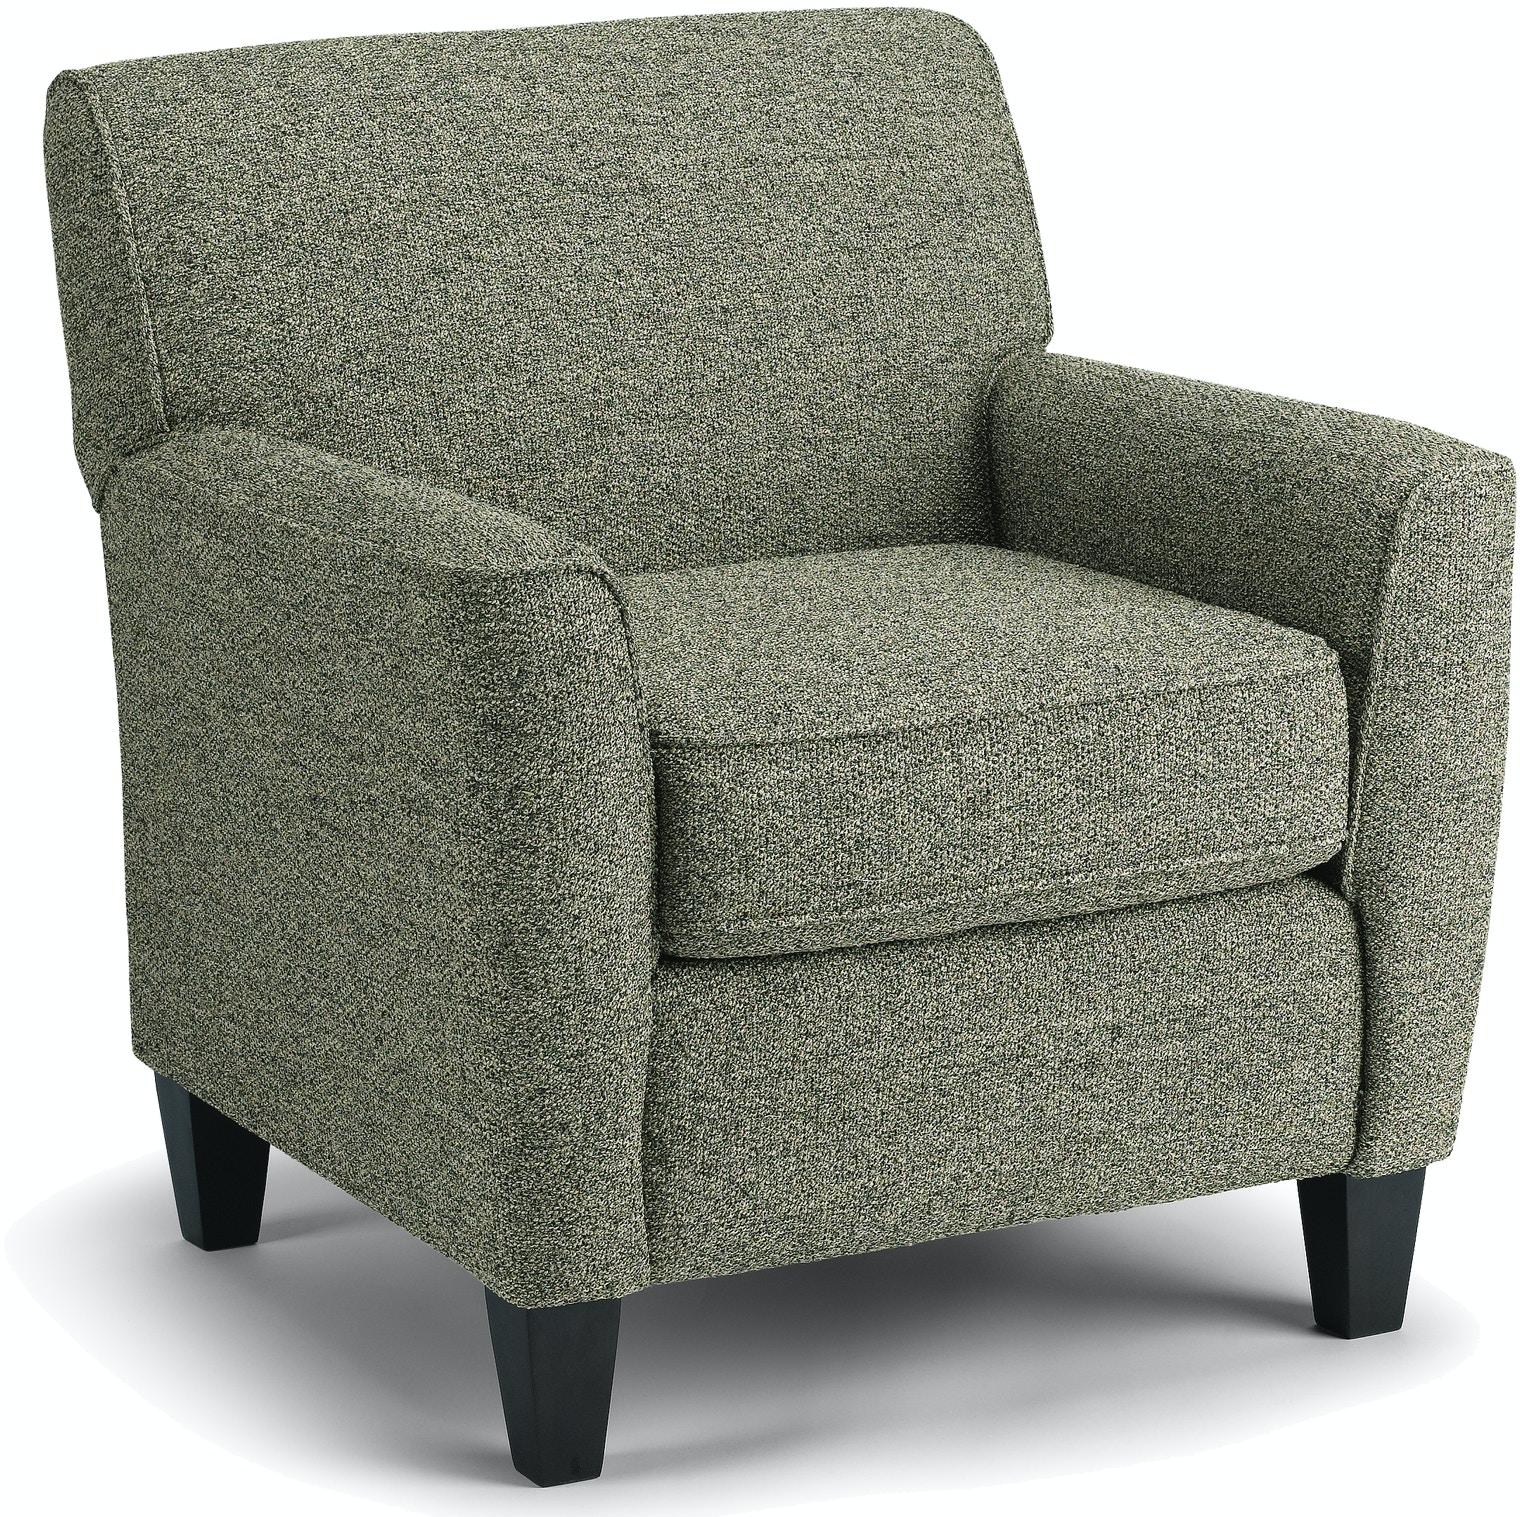 Best Furniture Stores In Atlanta Best Home Furnishings Living Room Club Chair 4190 Ramsey